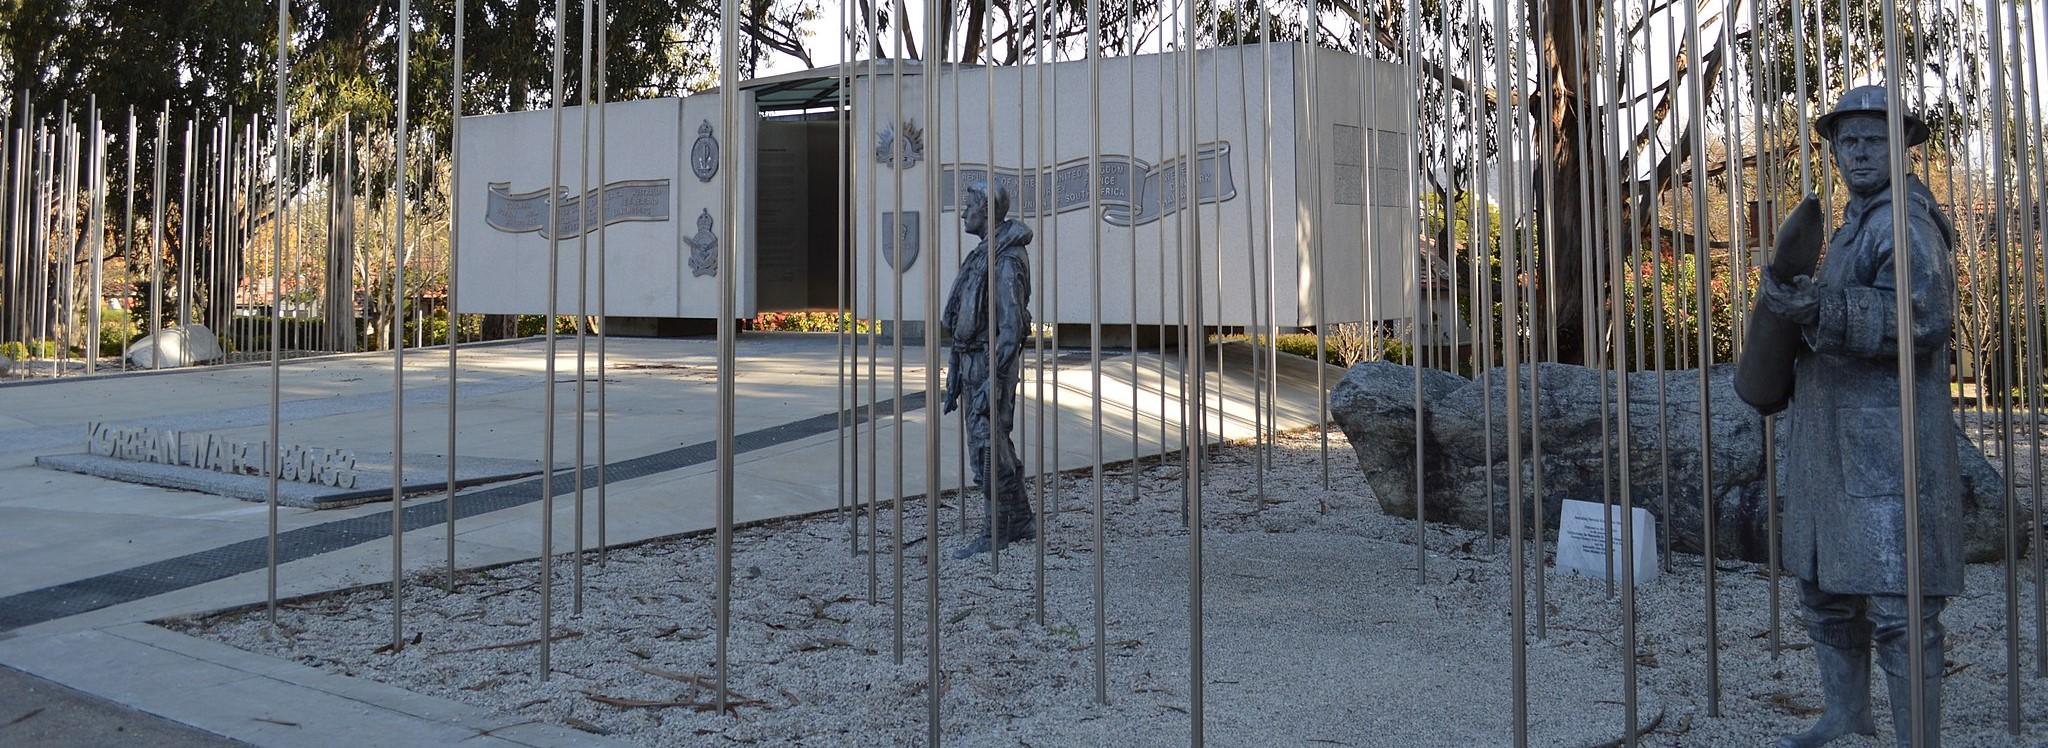 Australian National Korean War Memorial, Canberra (Photo: Mattinbgn/Wikimedia)